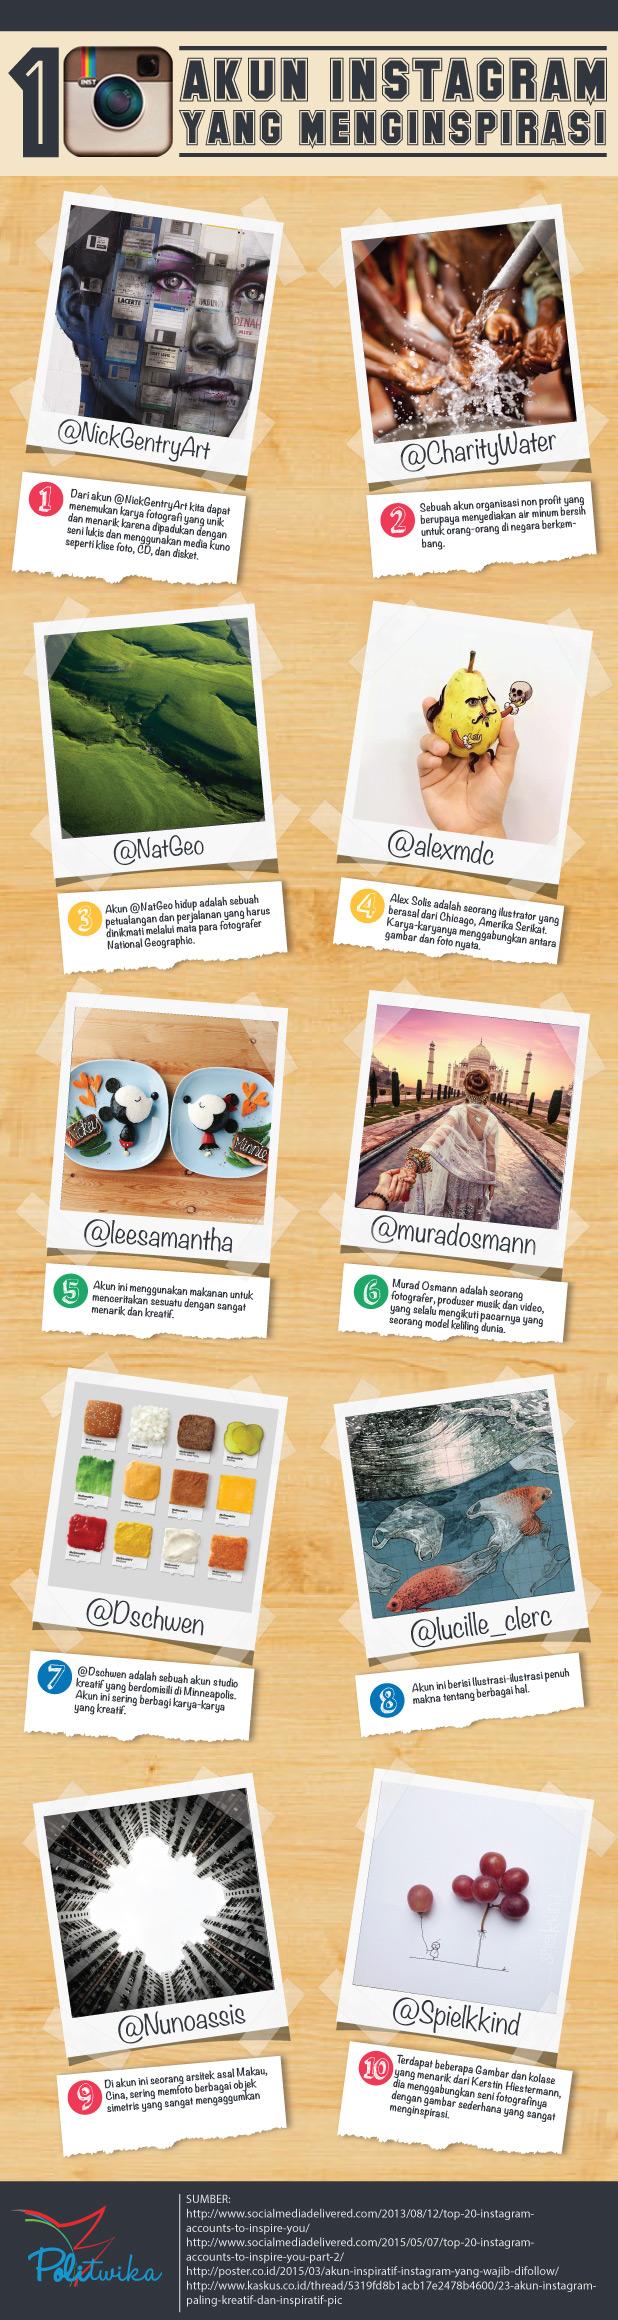 infografik-akun-instagram